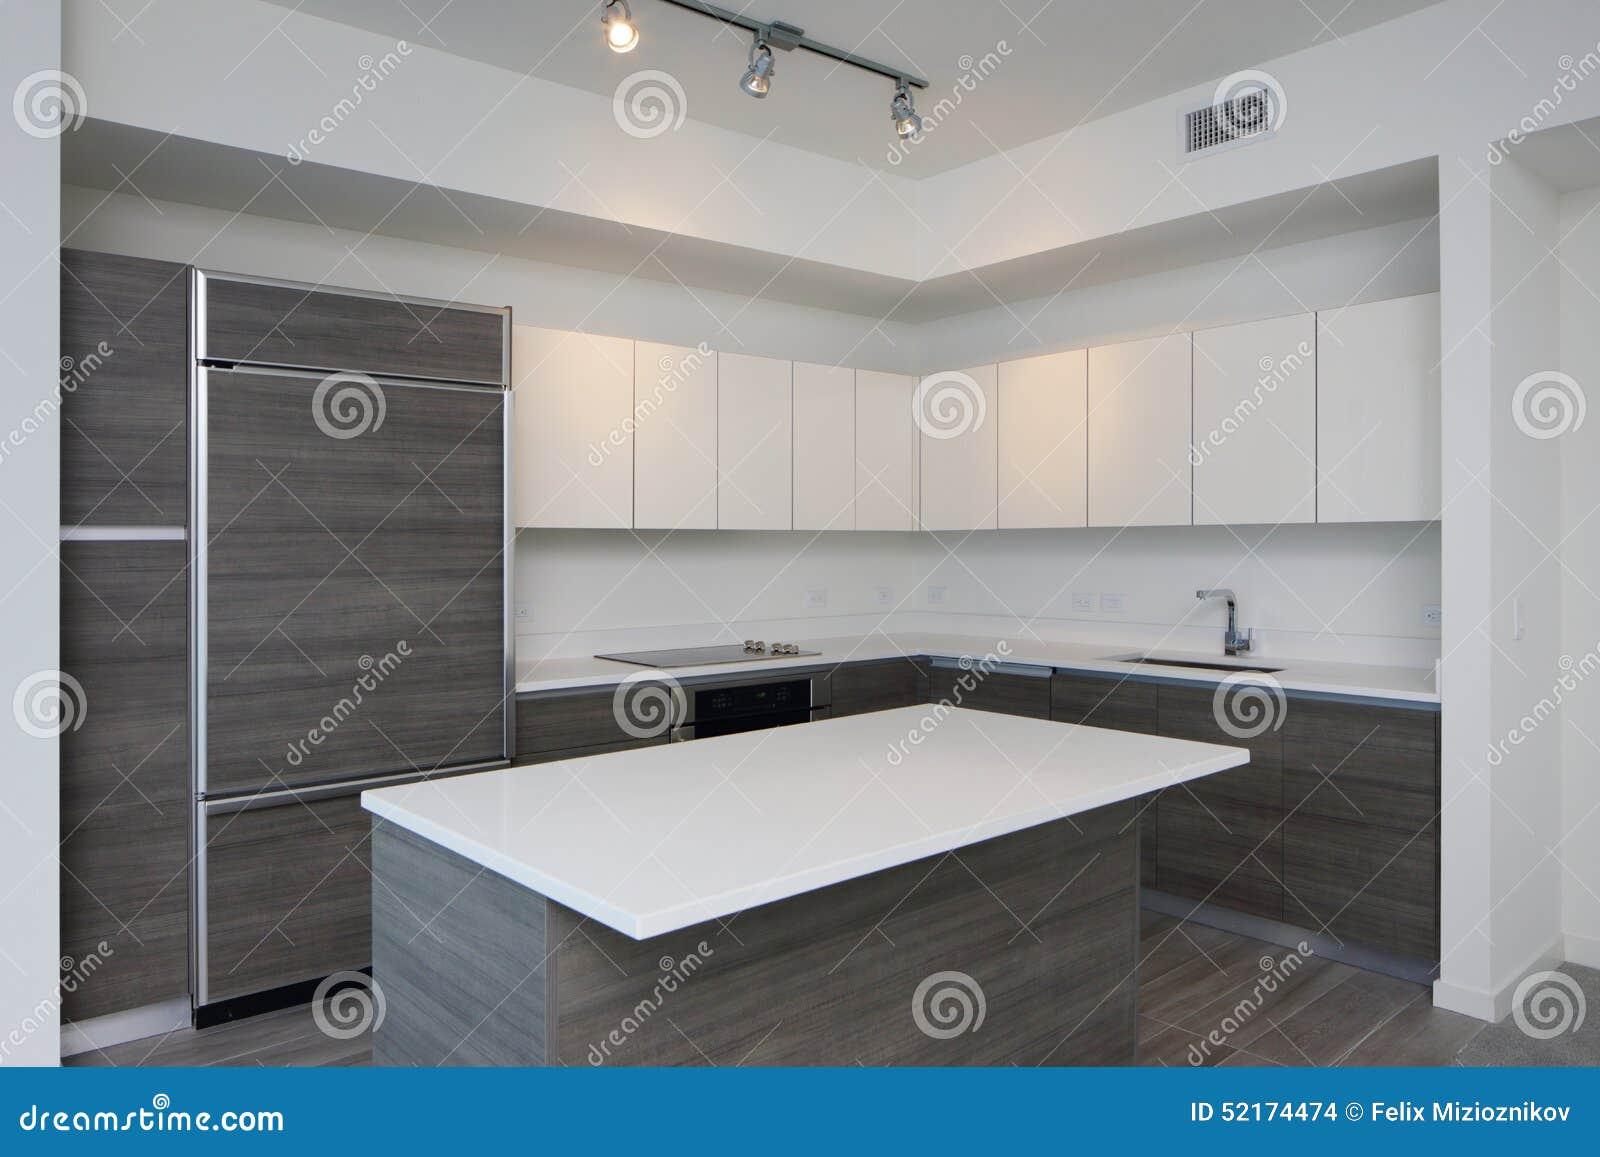 Moderne keuken met eiland stock foto afbeelding bestaande uit landgoed 52174474 - Afbeelding moderne keuken ...